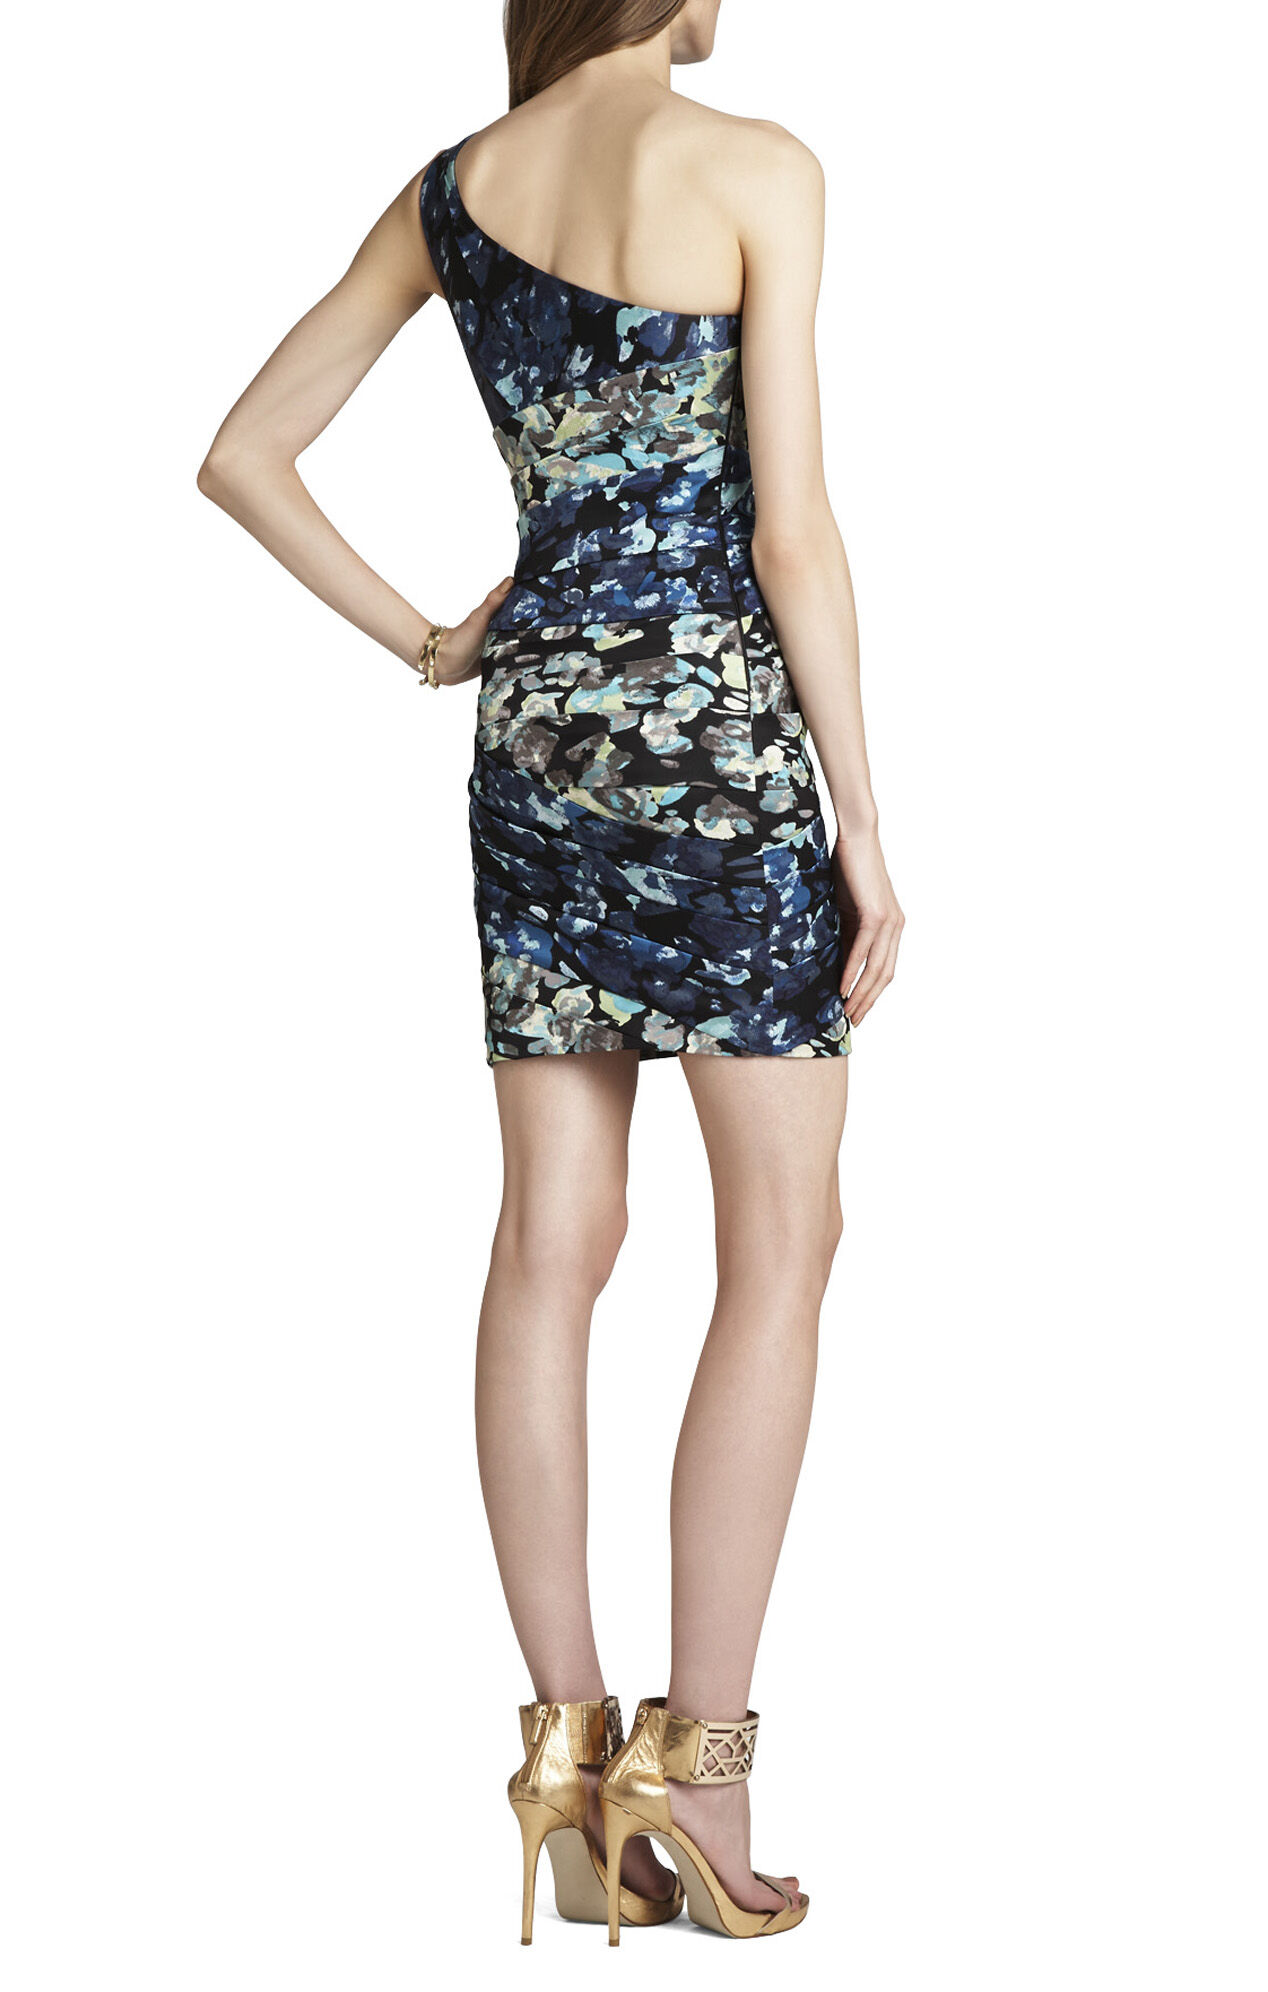 Paige One-Shoulder Print-Blocked Dress